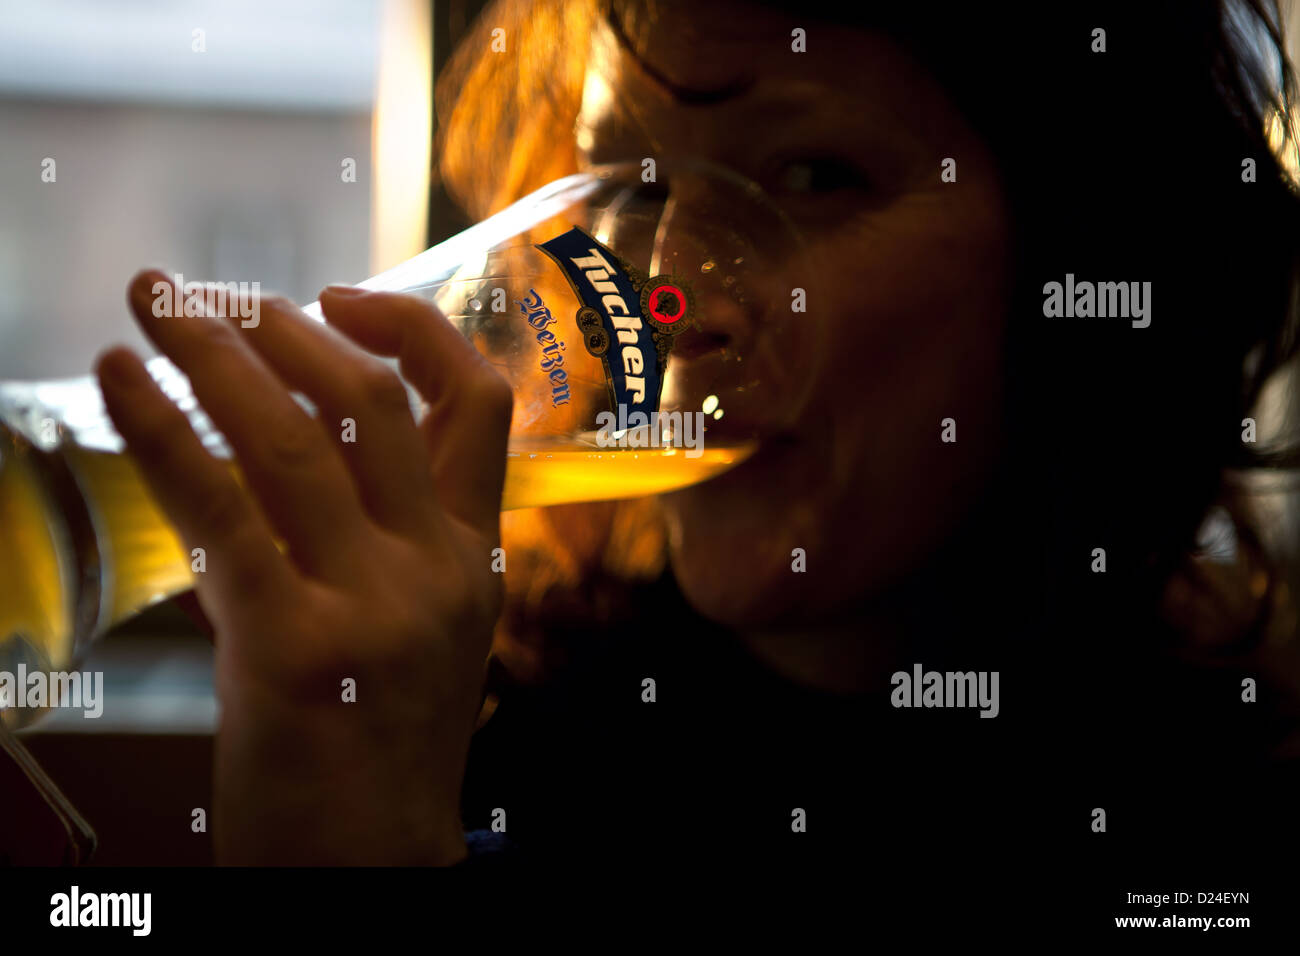 Woman drinking German Bavarian Beer Stock Photo